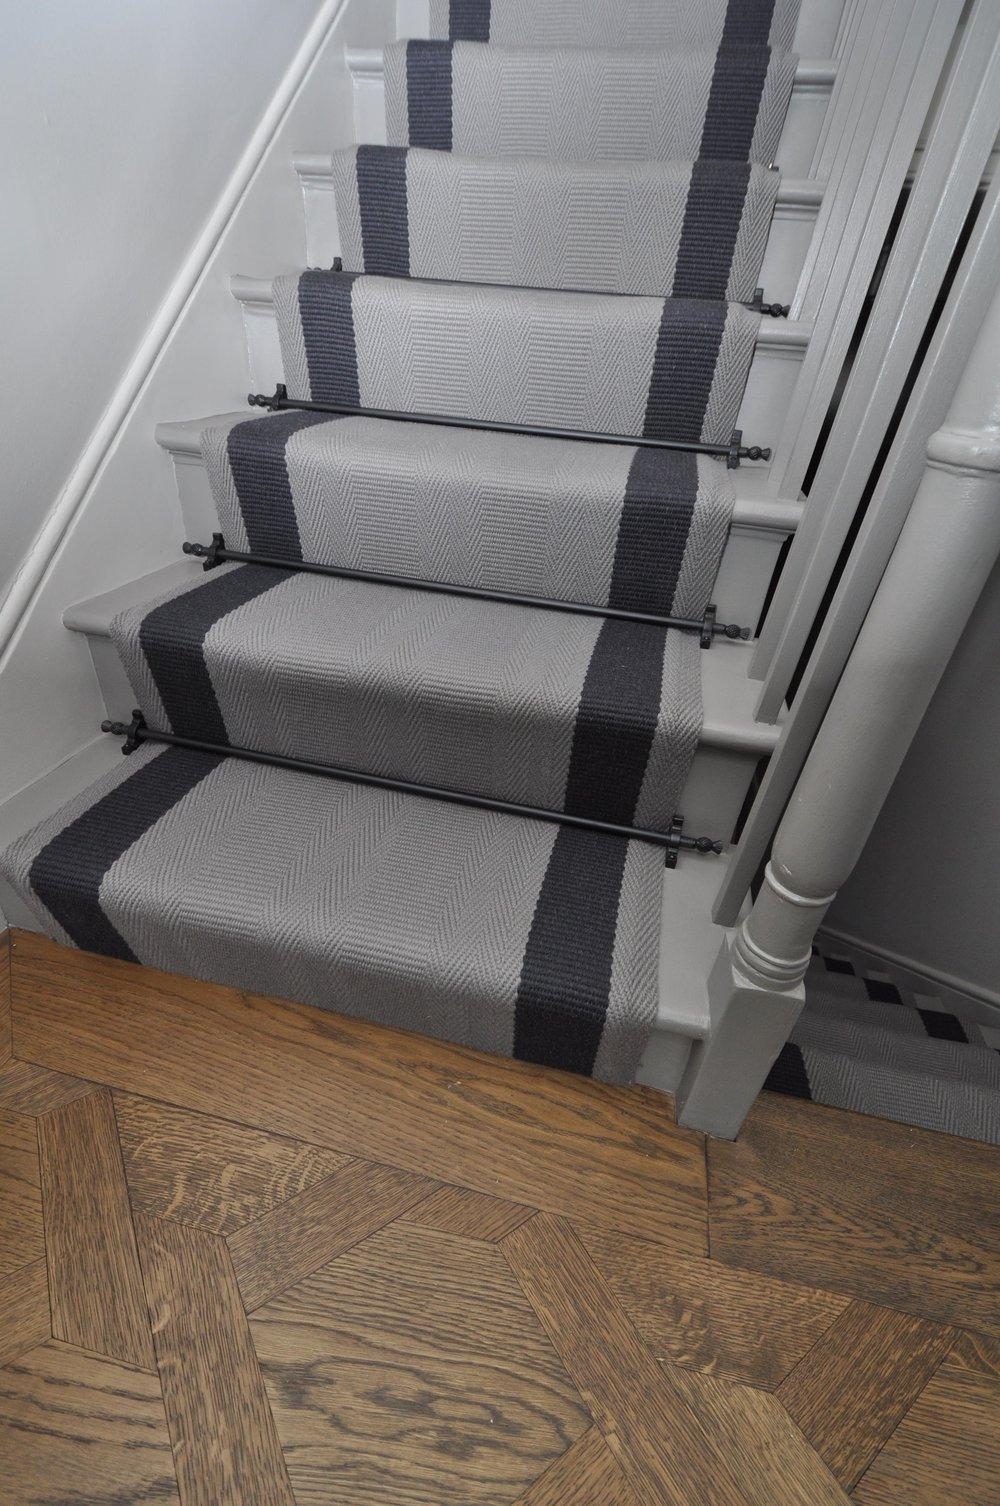 flatweave-stair-runner-london-bowloom-off-the-loom-geometric-carpet-DSC_1131.jpg